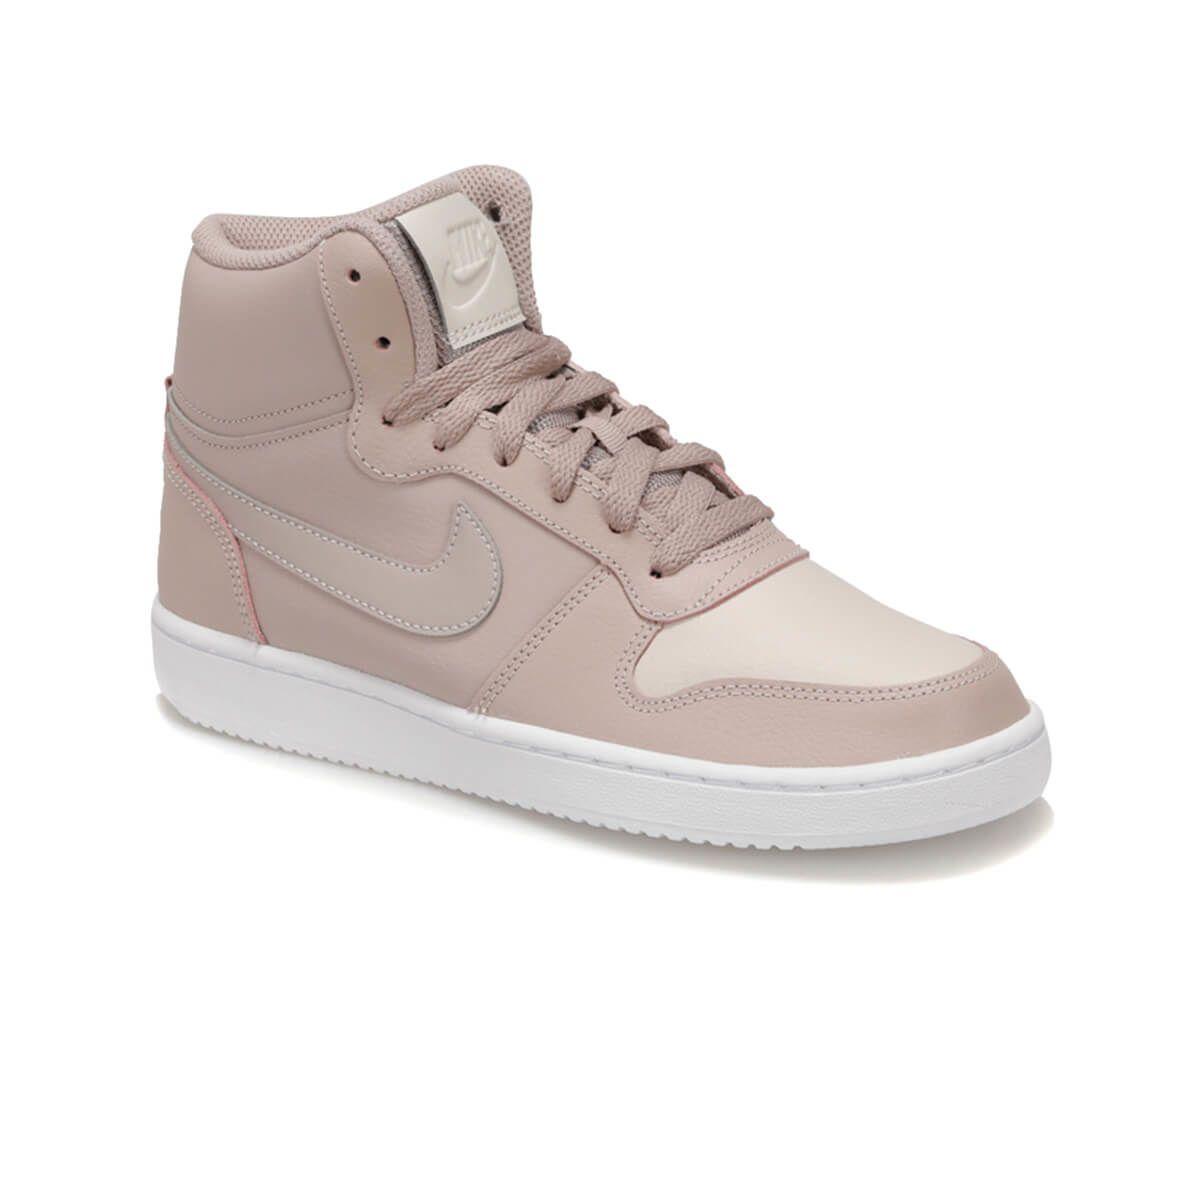 Nike Nike Wmns Nike Ebernon Mid Lila Kadin Sneaker Flo Ayakkabi Sneaker Nike Kadin